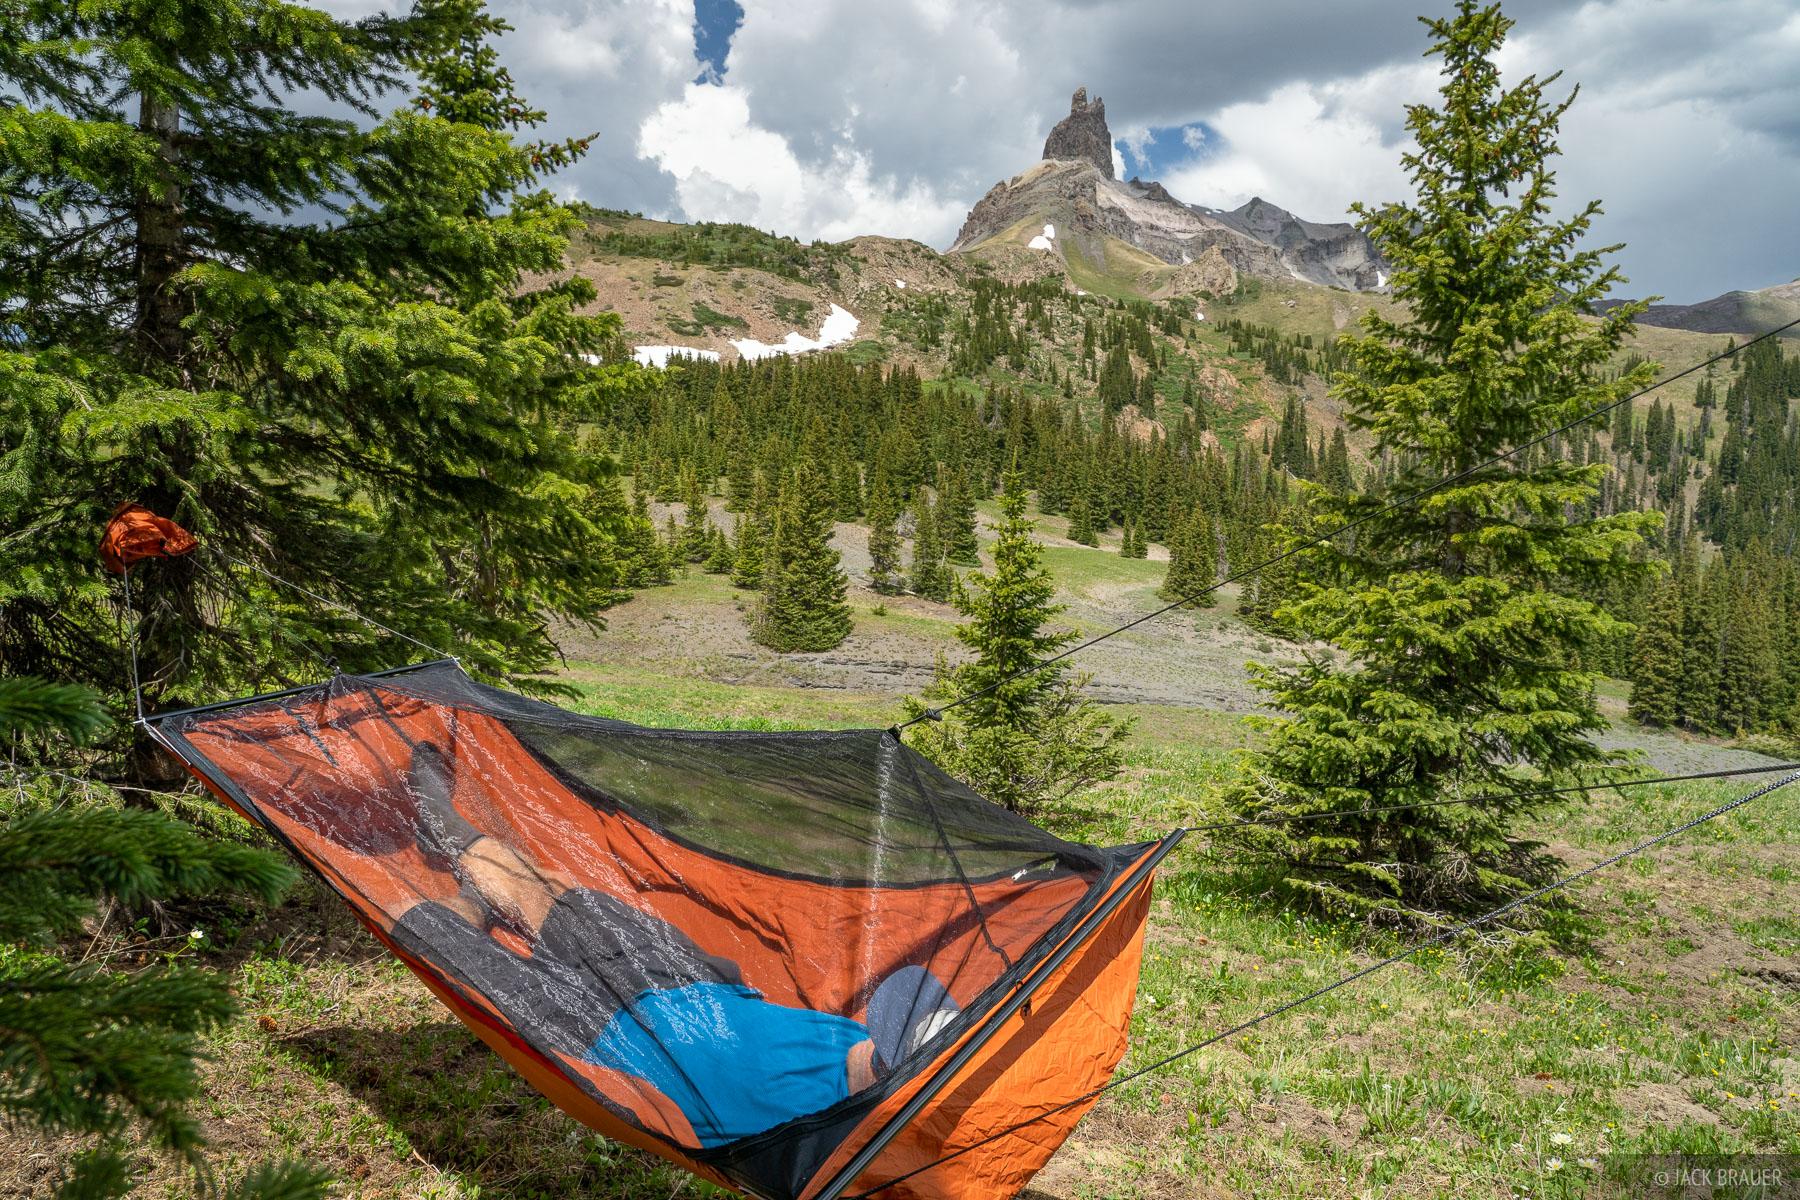 Colorado, Lizard Head Peak, Lizard Head Wilderness, San Juan Mountains, San Miguel Range, hammock, photo